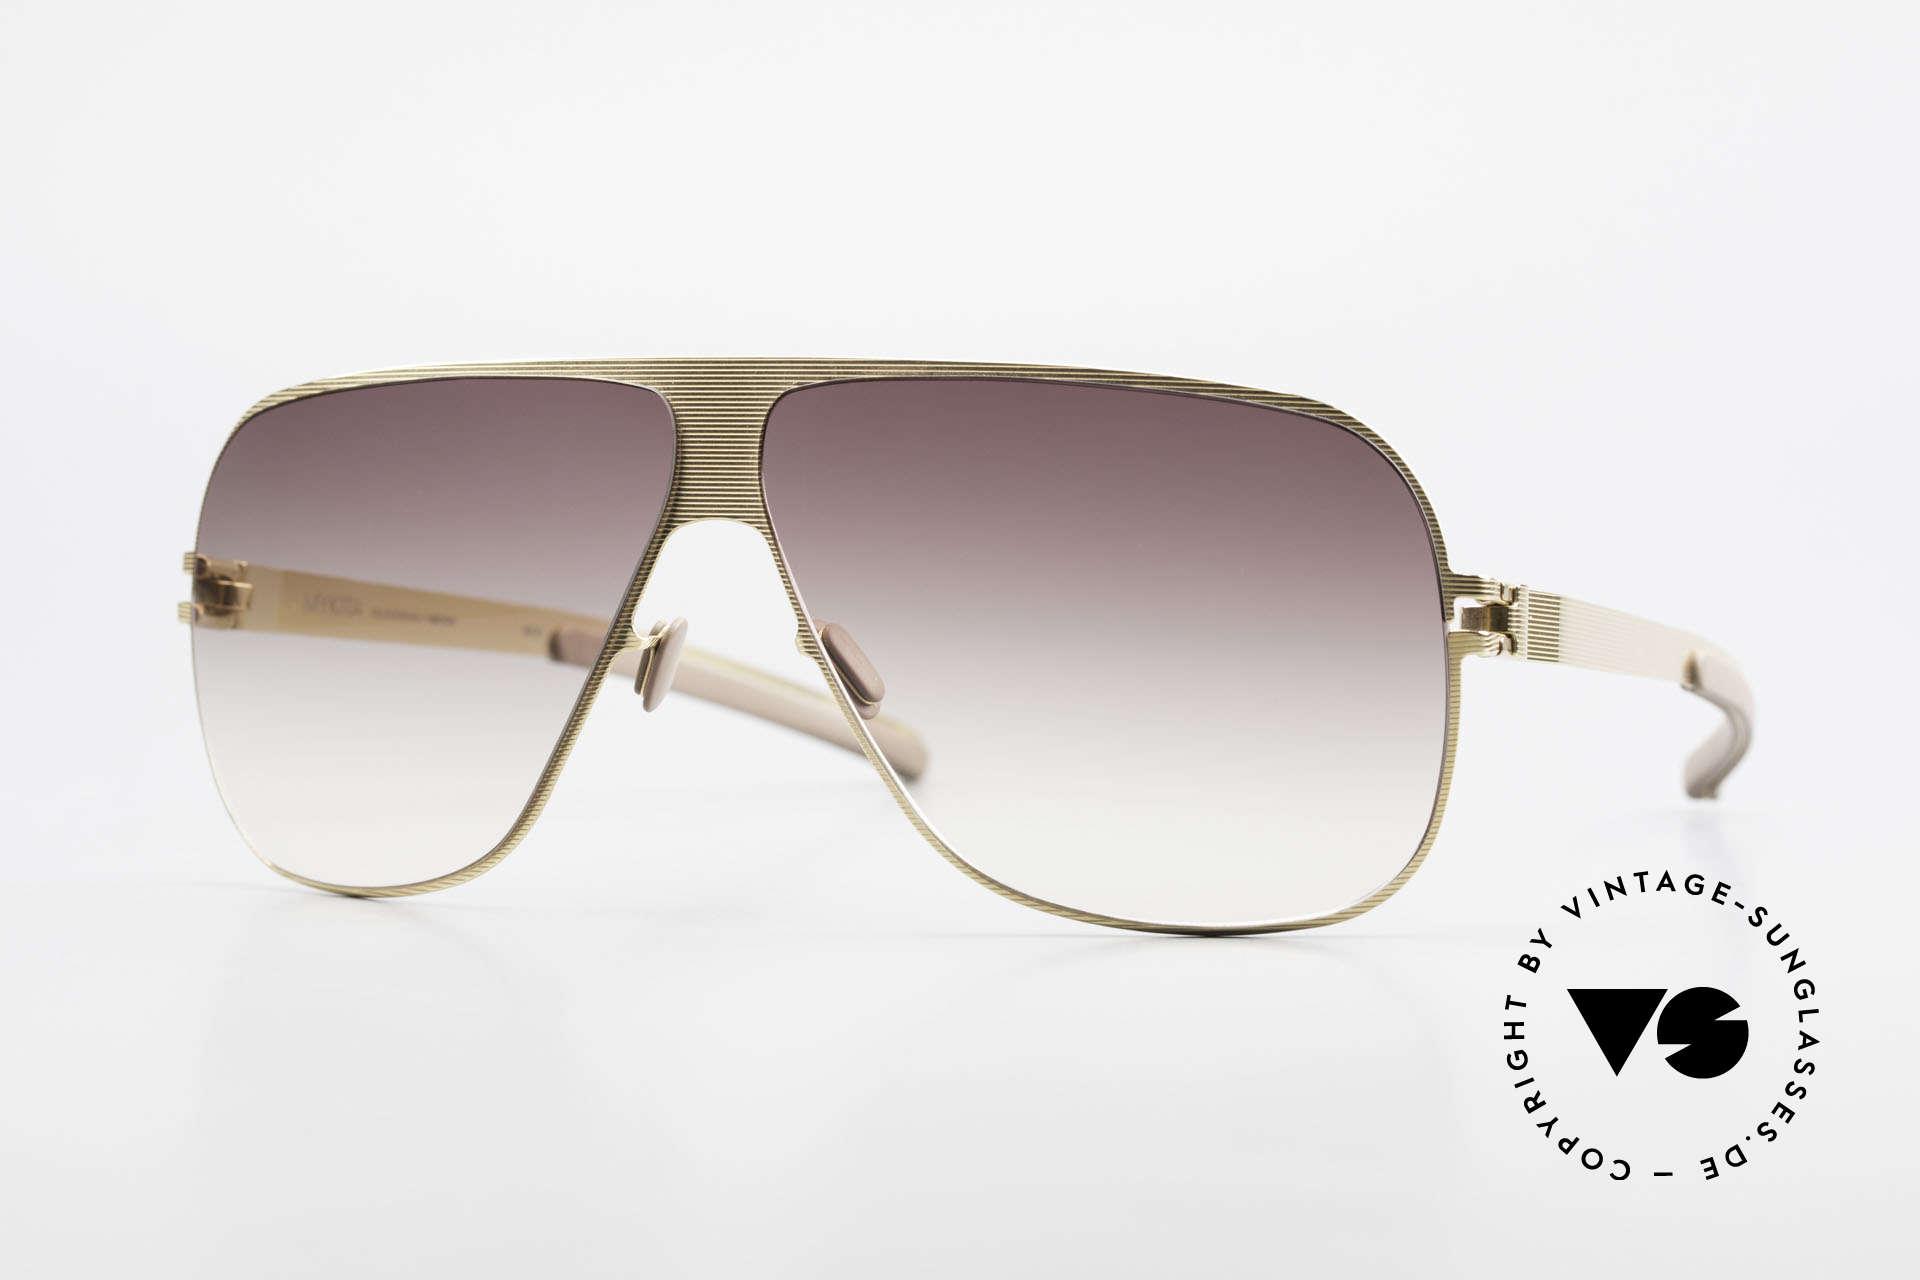 Mykita Hector Vintage Mykita Frame From 2009, original VINTAGE MYKITA men's sunglasses from 2009, Made for Men